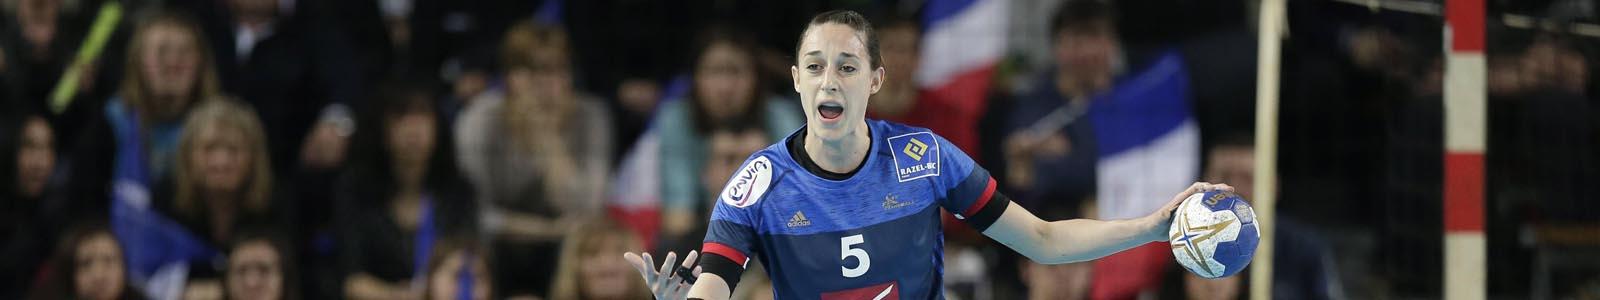 Camille Ayglon handball